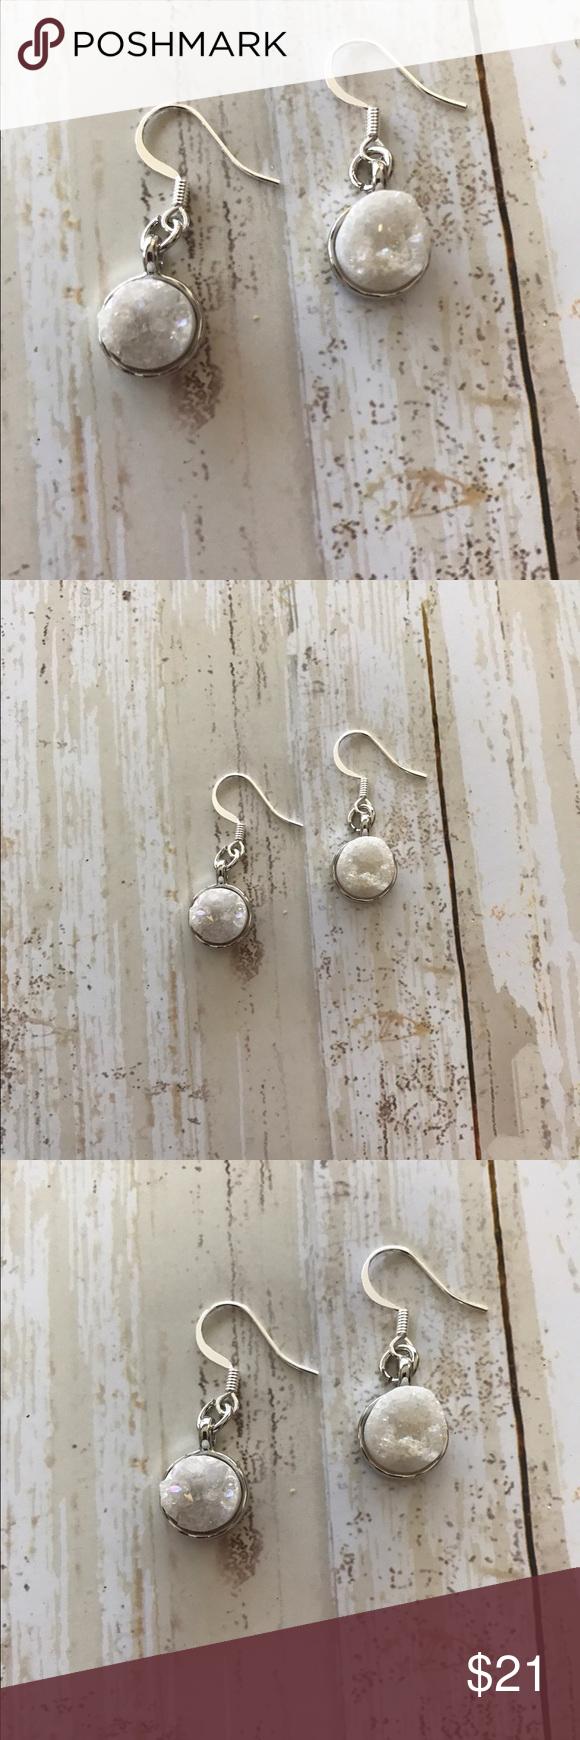 Druzy Earrings Gorgeous, sparkly, white genuine druzy earrings. 3/4 inch length. Clean, crisp accessory for your wardrobe. original livandgray Jewelry Earrings